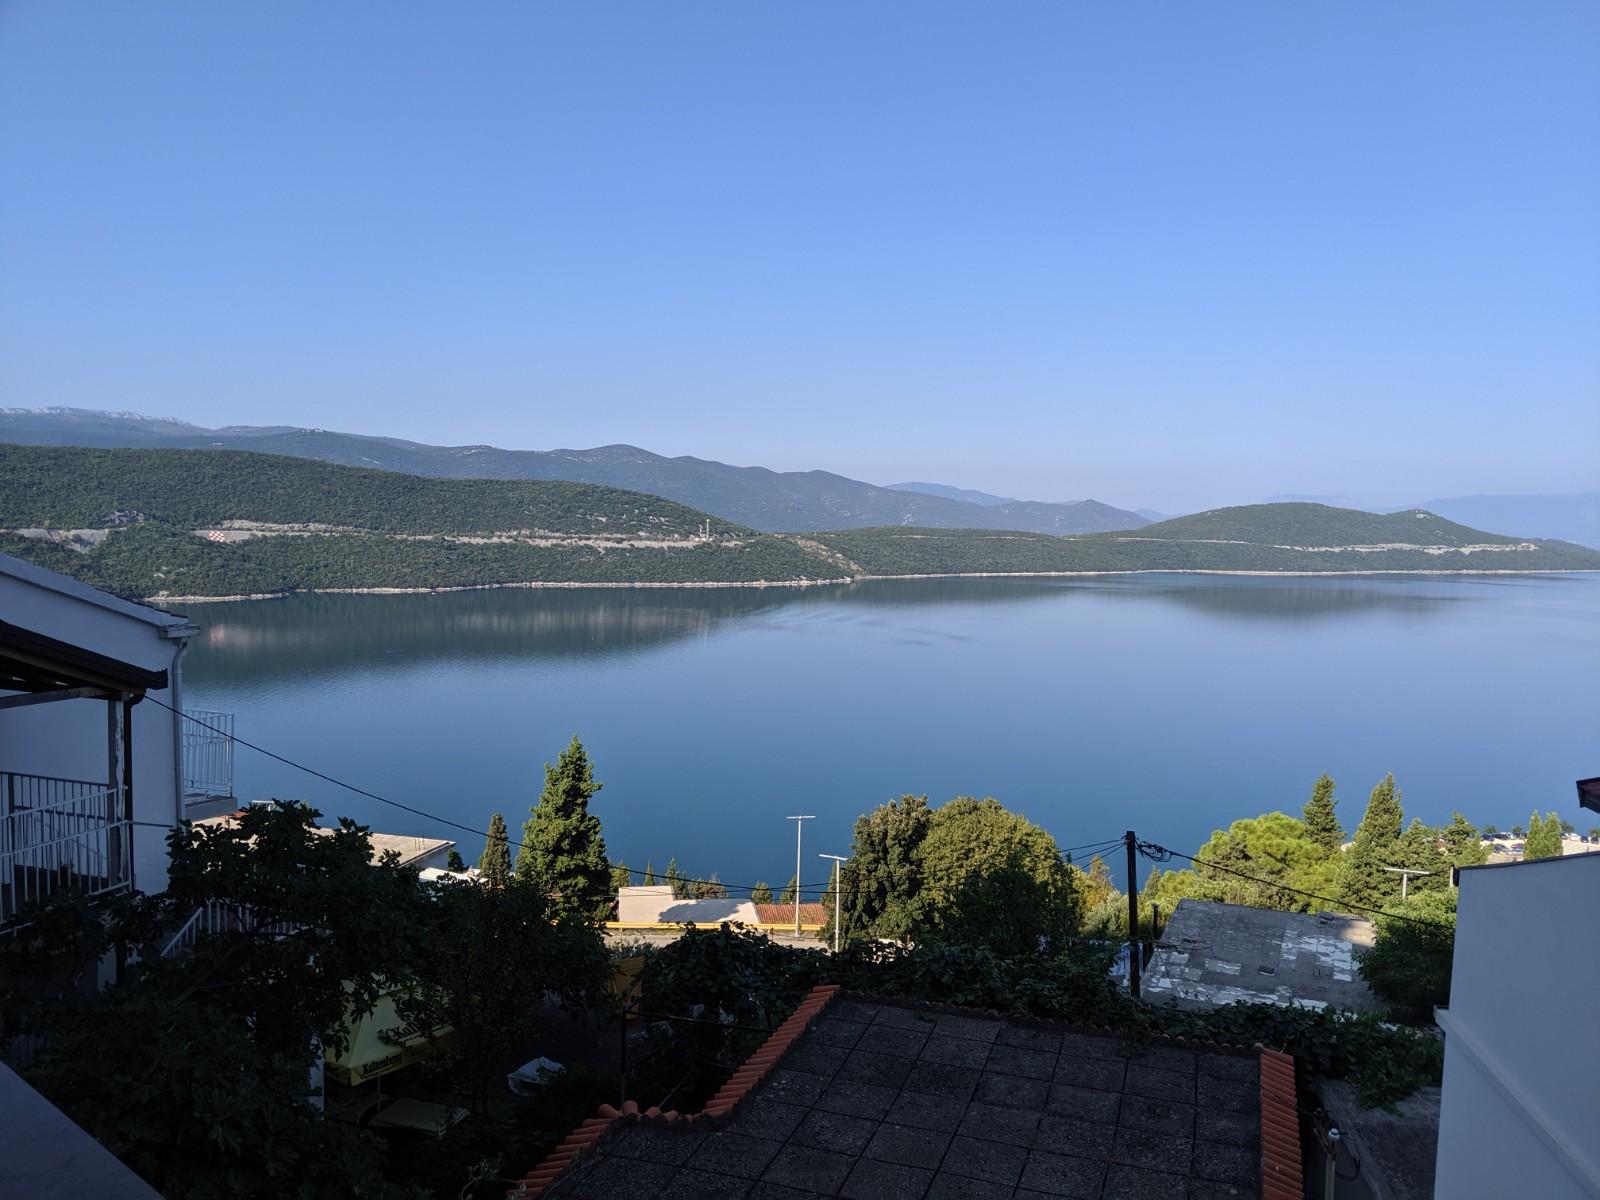 Neum Bosnia